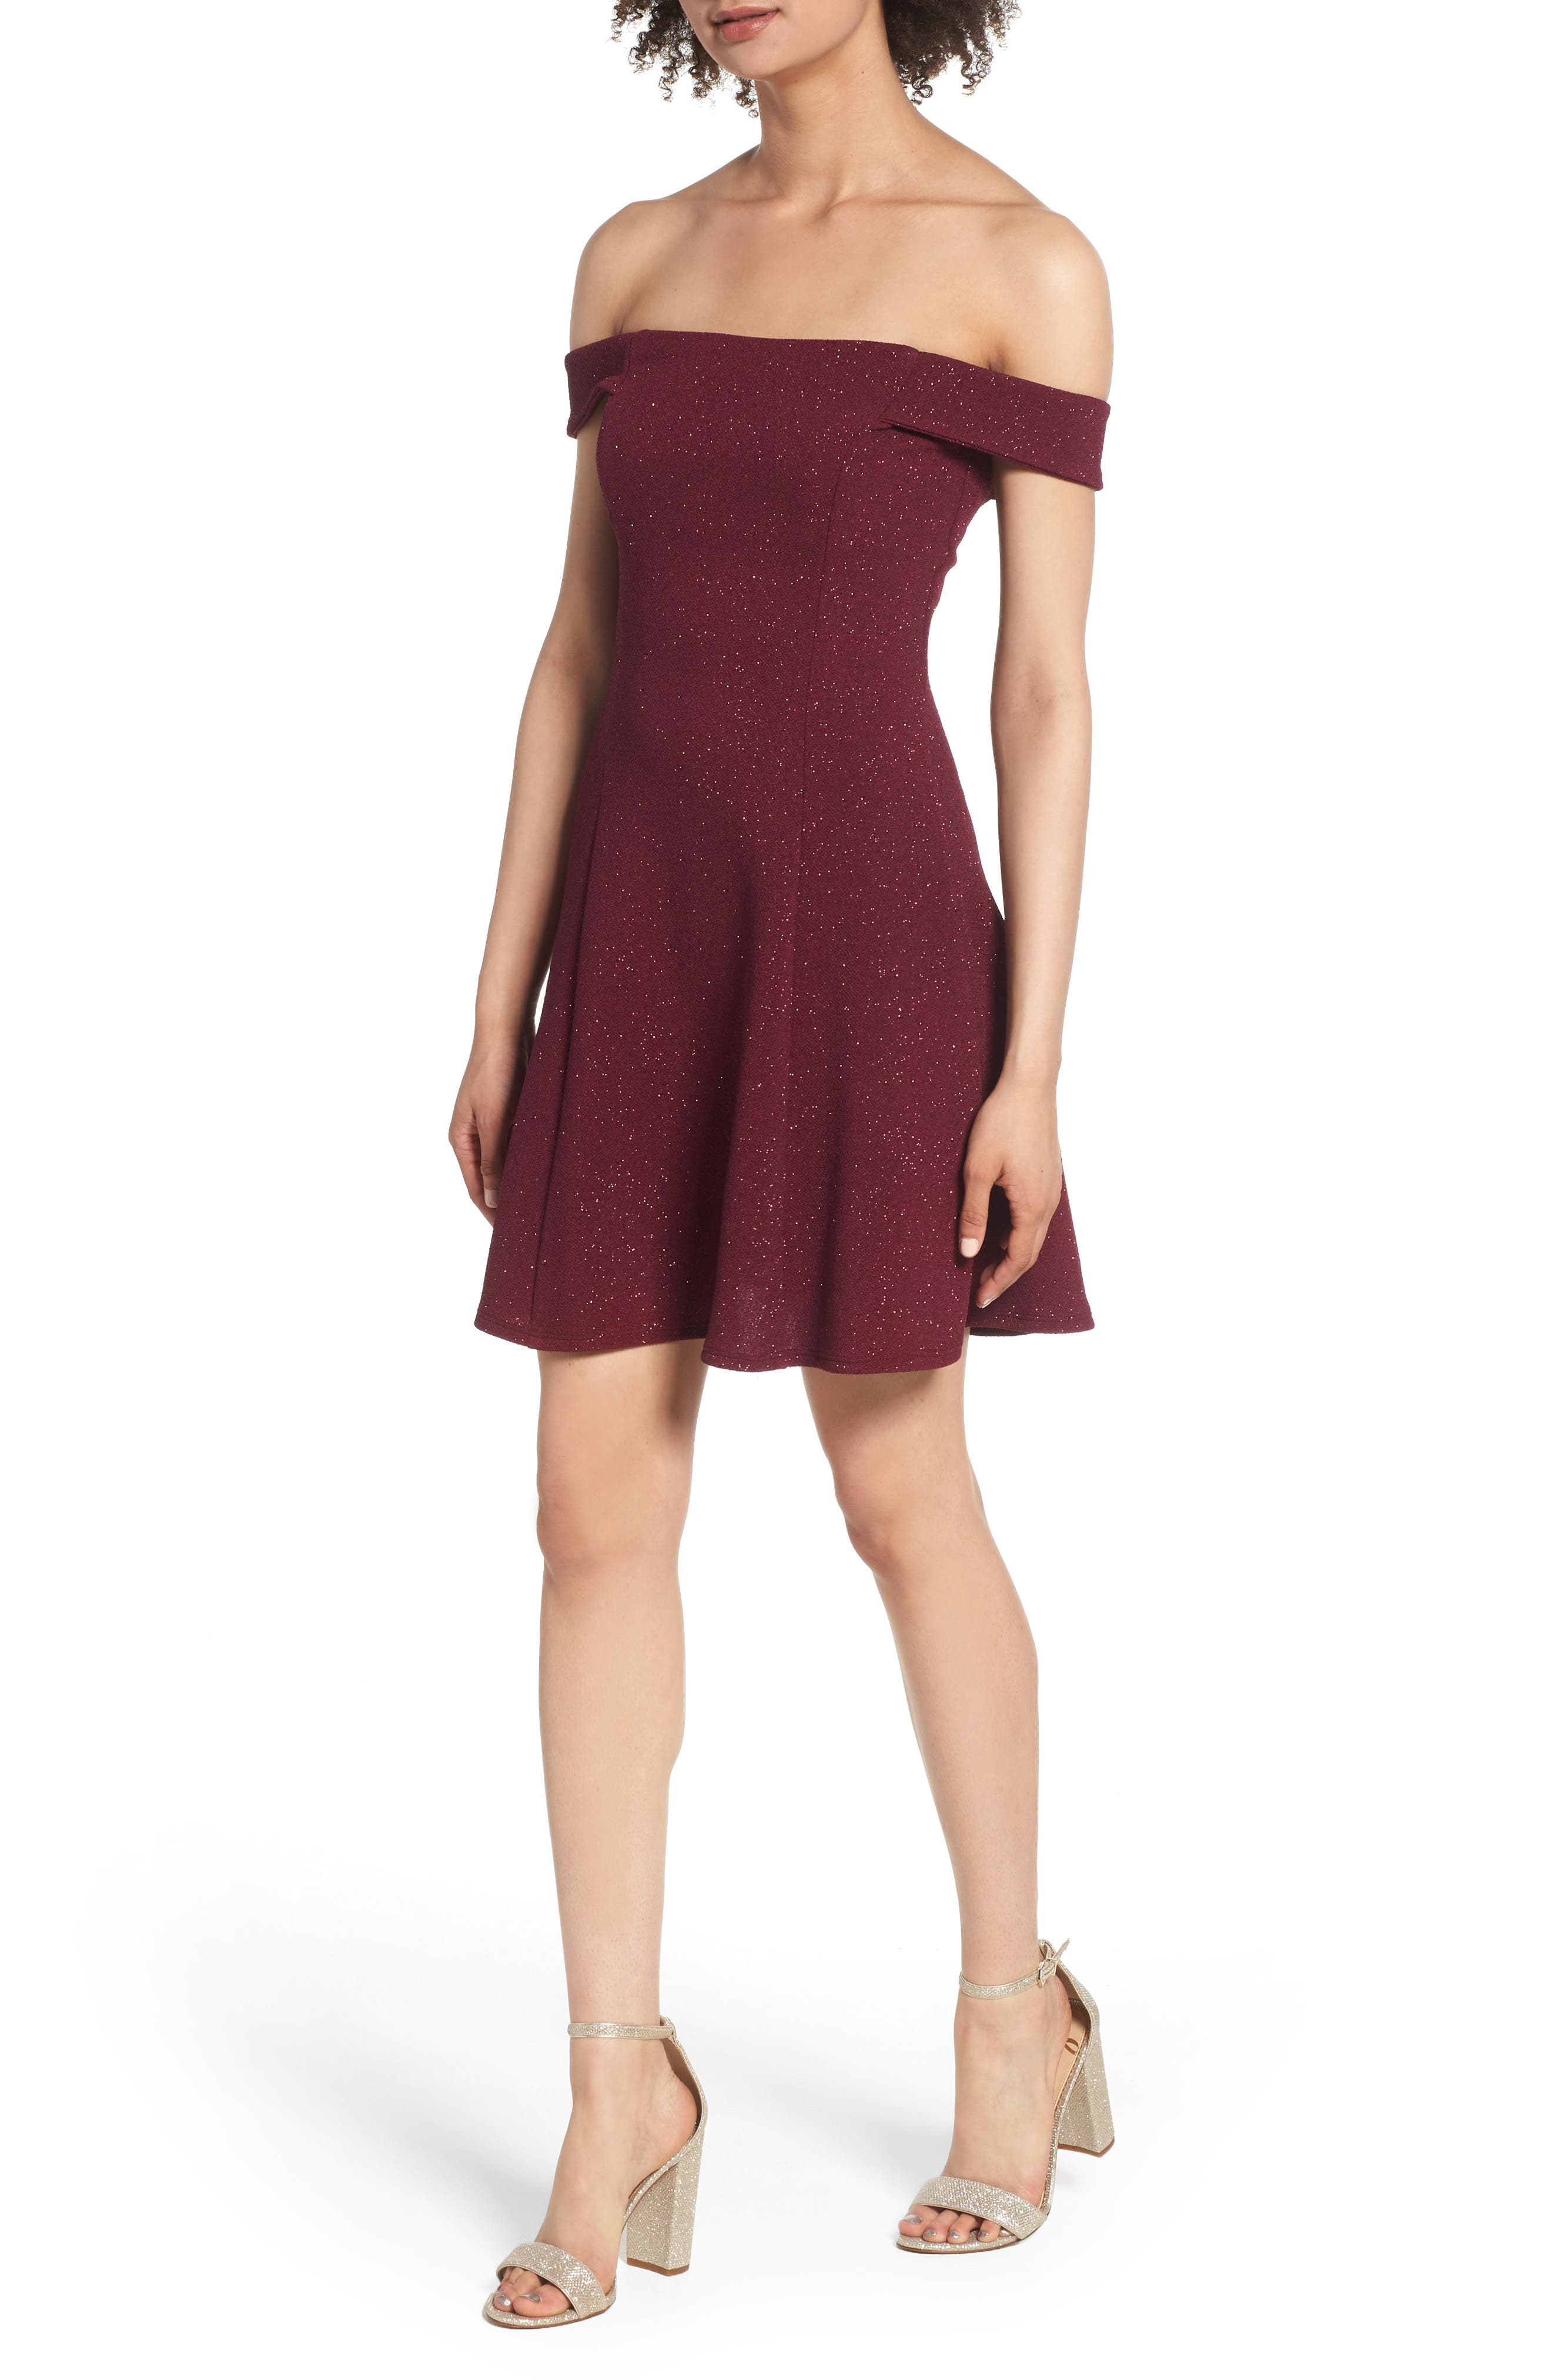 SPEECHLESS Glitter Off the Shoulder Dress, Main, color, BURGUNDY